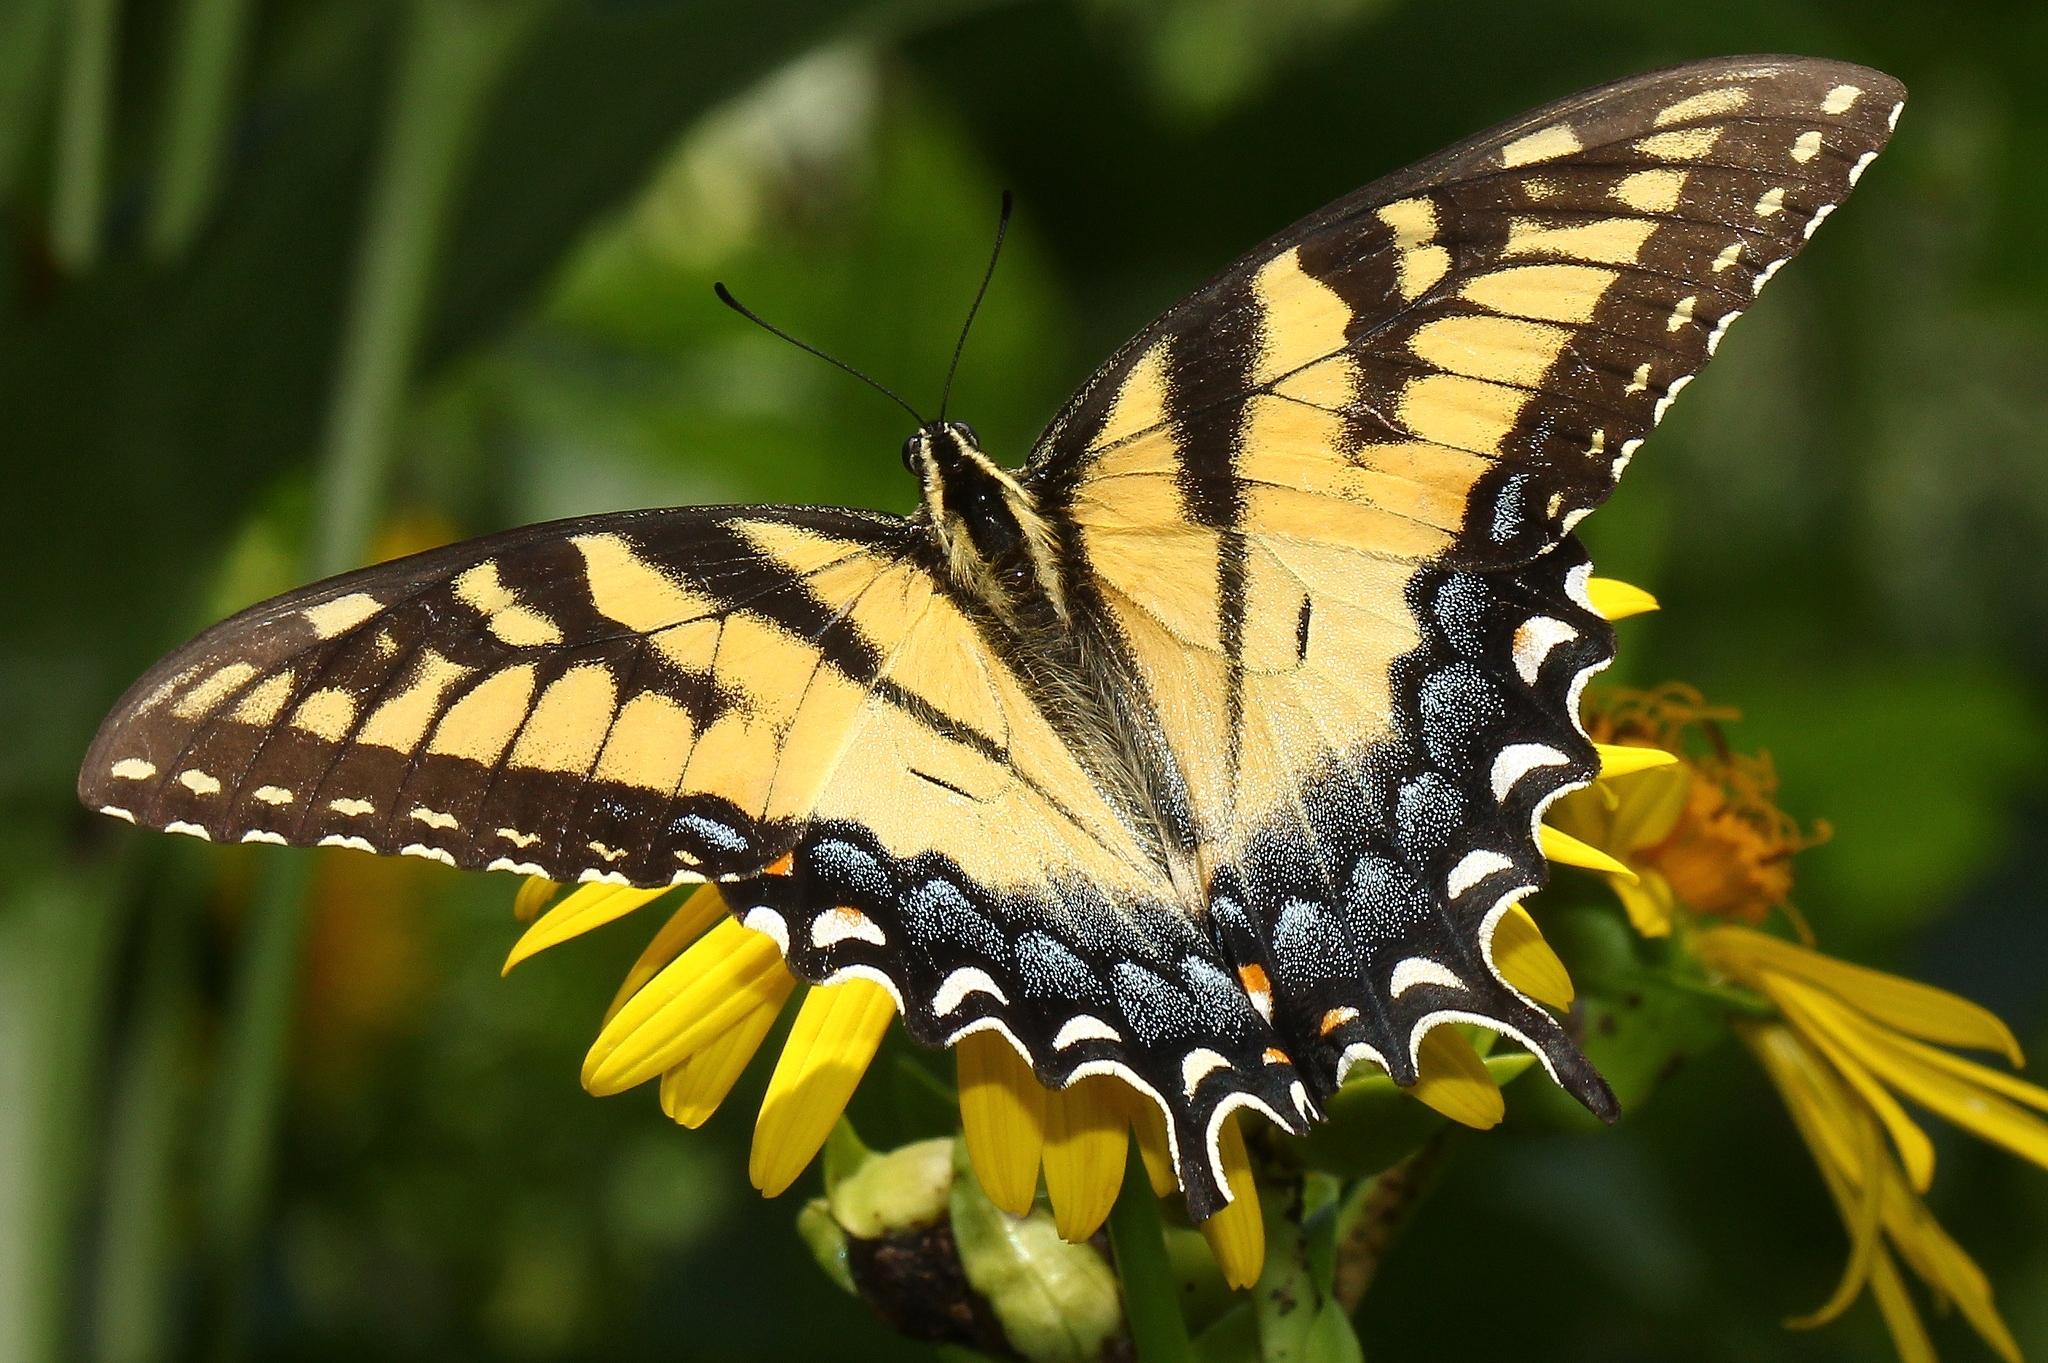 природа животные насекомое макро бабочки nature animals insect macro butterfly бесплатно